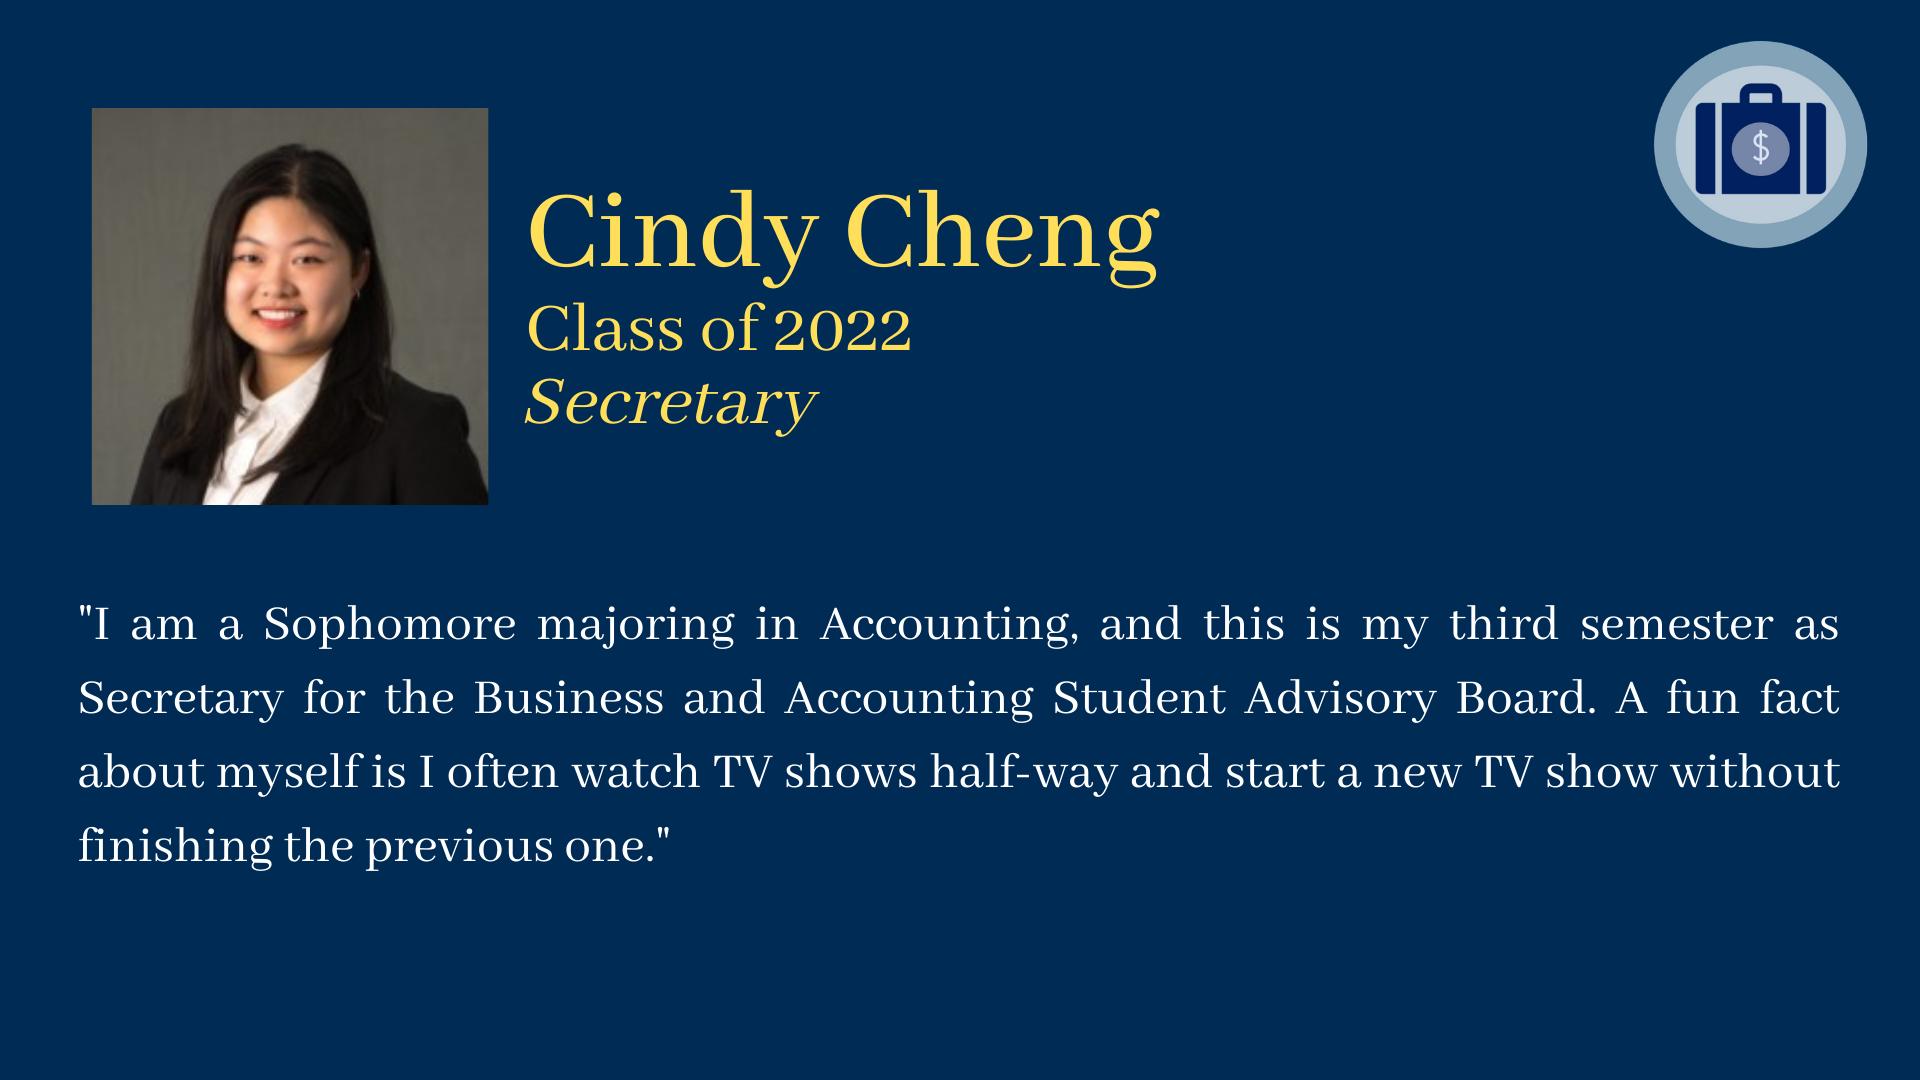 Cindy Cheng bio